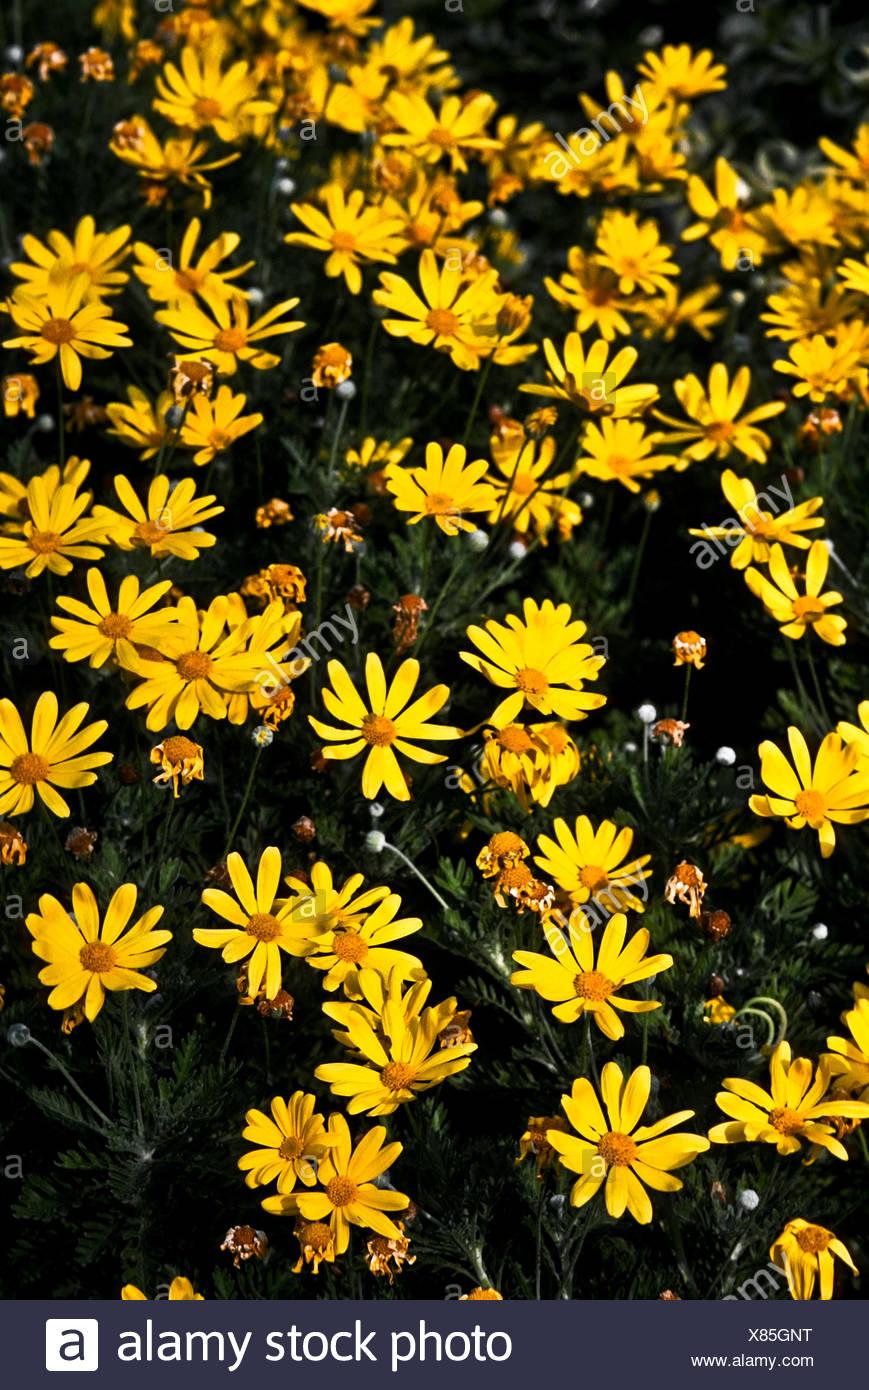 Euryops pectinatus is a daisy like flower that blooms in rich euryops pectinatus is a daisy like flower that blooms in rich yellows izmirmasajfo